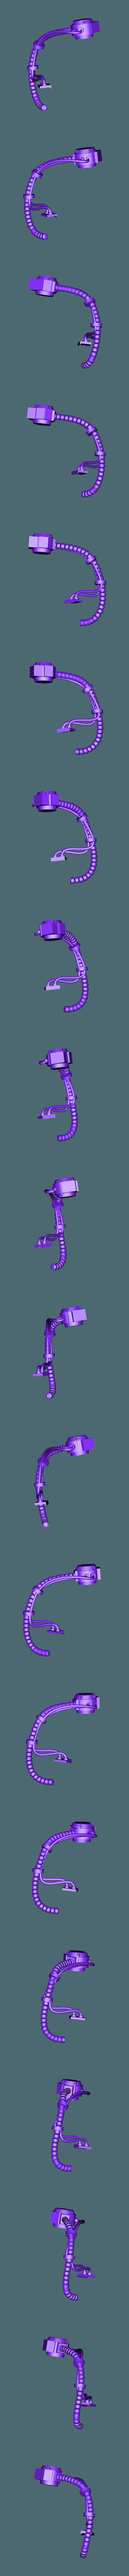 Aggressor_5_Right_Hoses.stl Download free STL file Flame Armed Instigators • 3D printable template, danny_cyanide